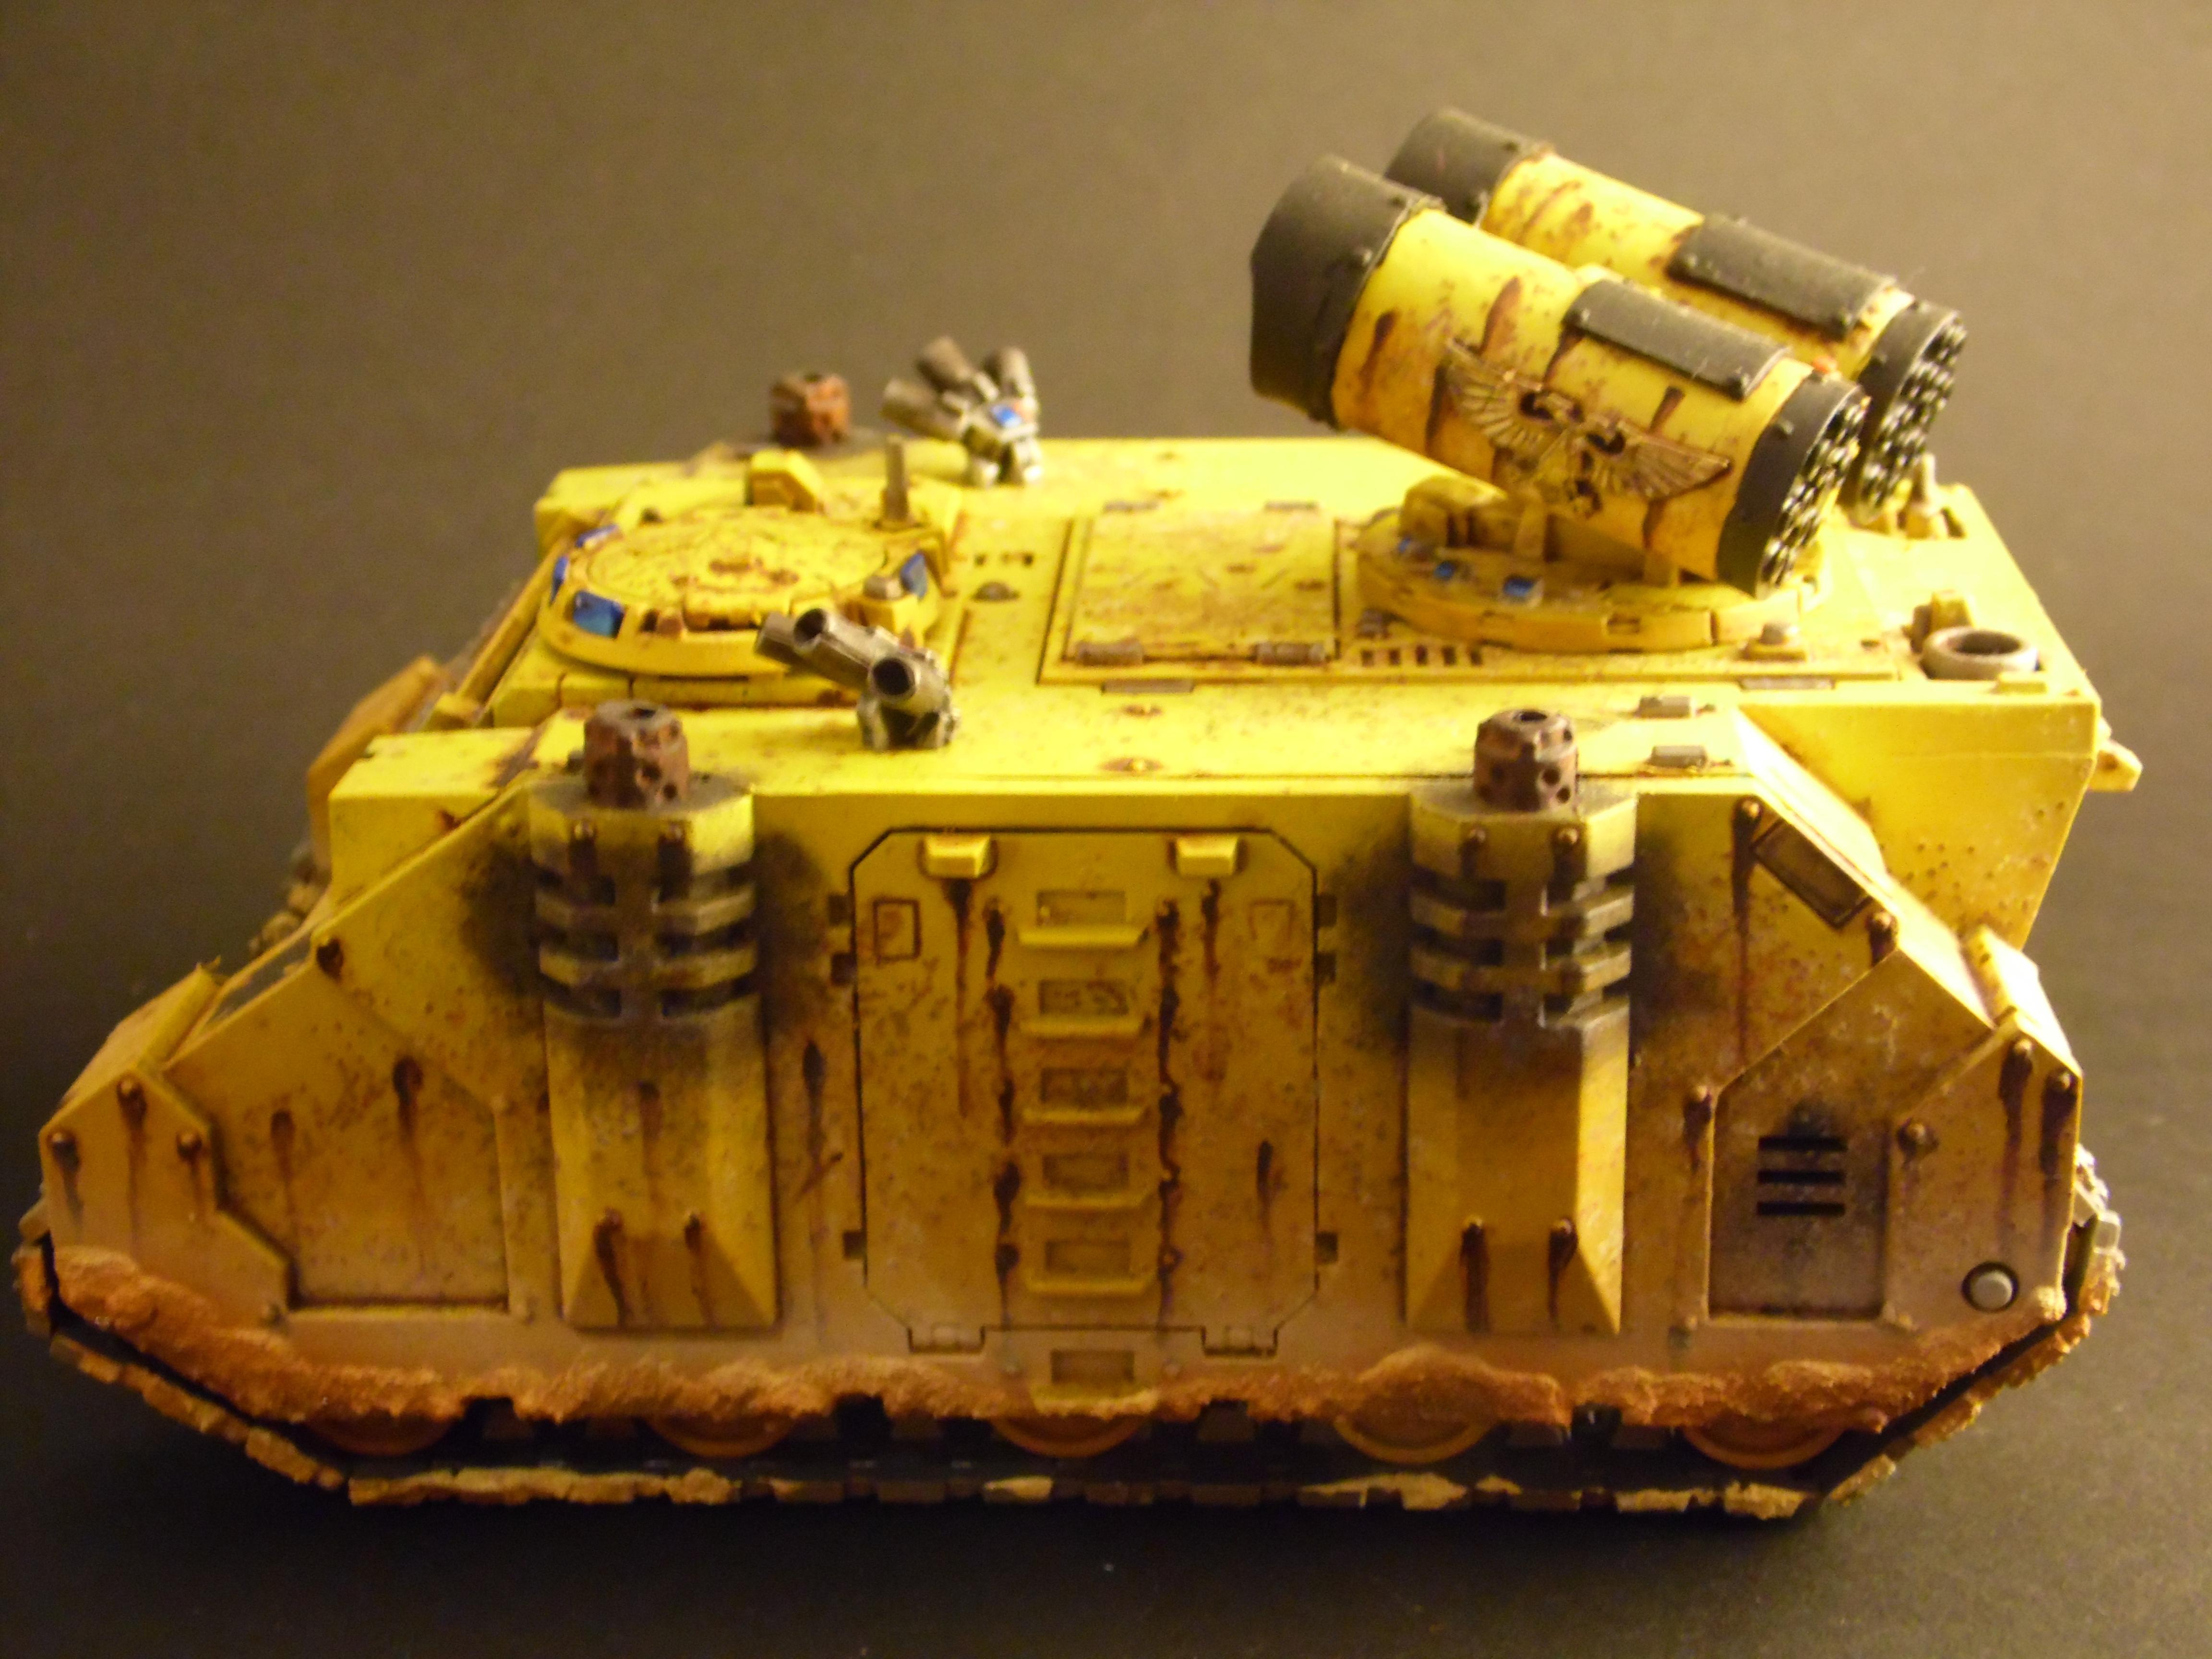 Fist, Imperial, Painting, Rusty, Rustytankpainting, Tank, Warhammer 40,000, Warhammer Fantasy, Whirlwind